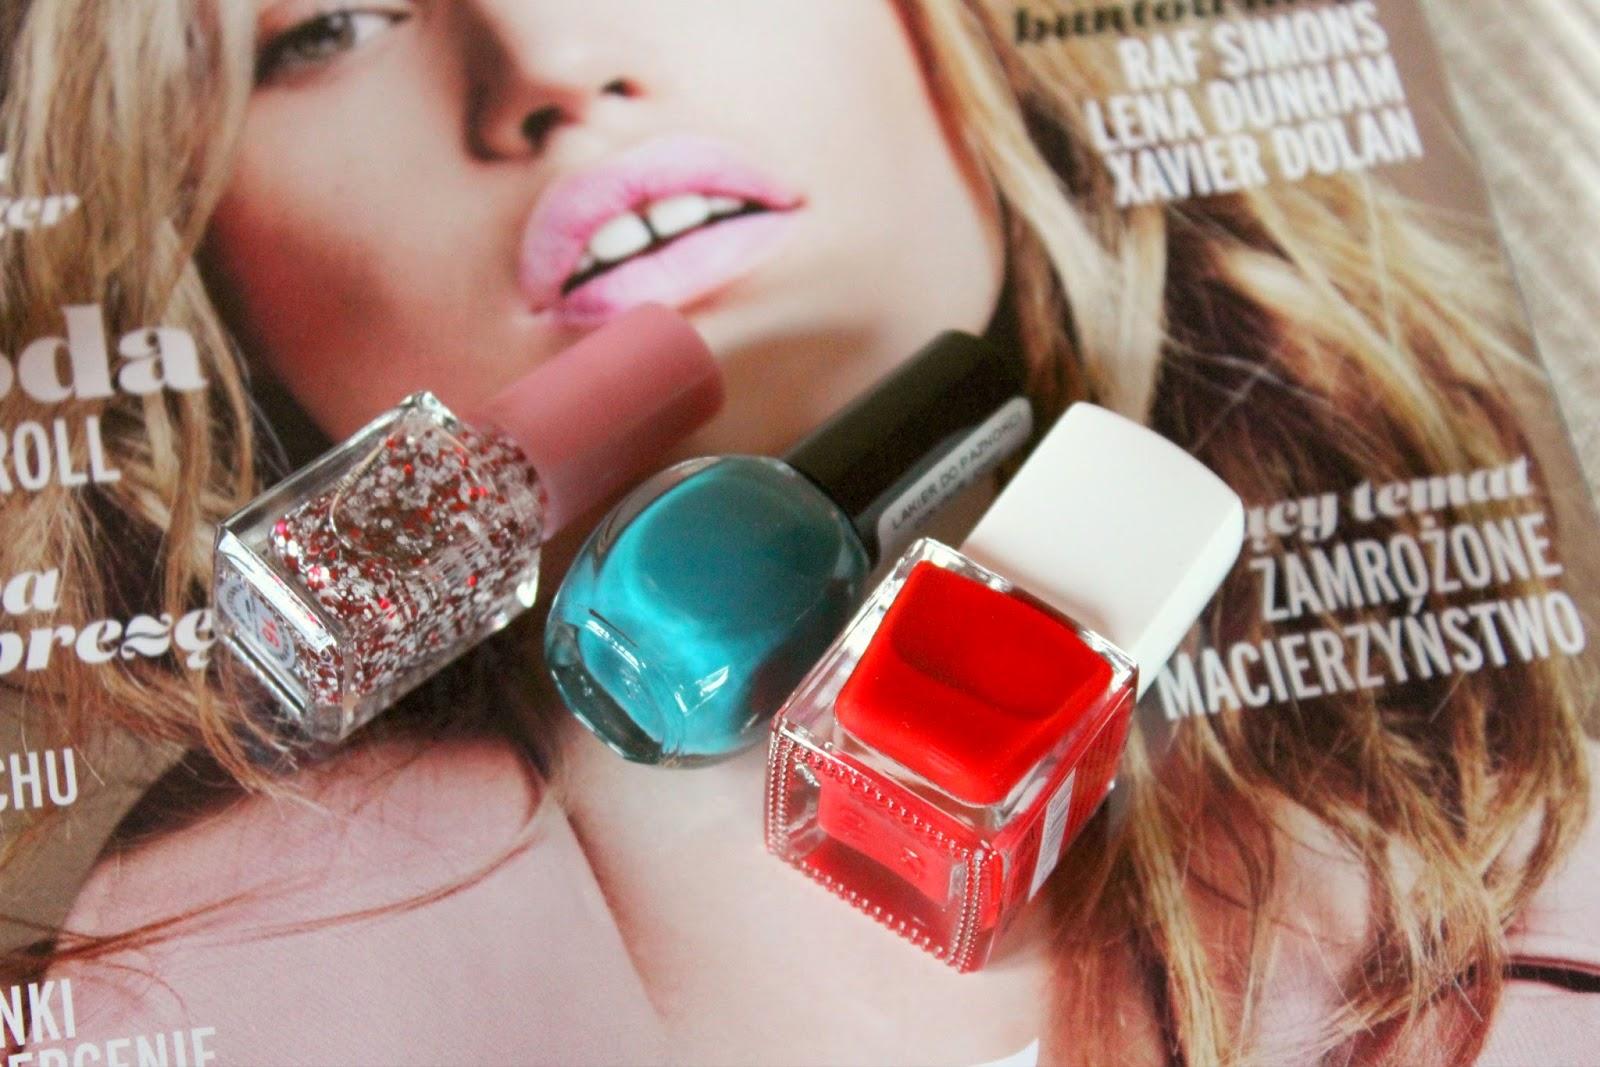 Świąteczny  manicure  My Secret #119, Colour Chic #17, Ushine #16